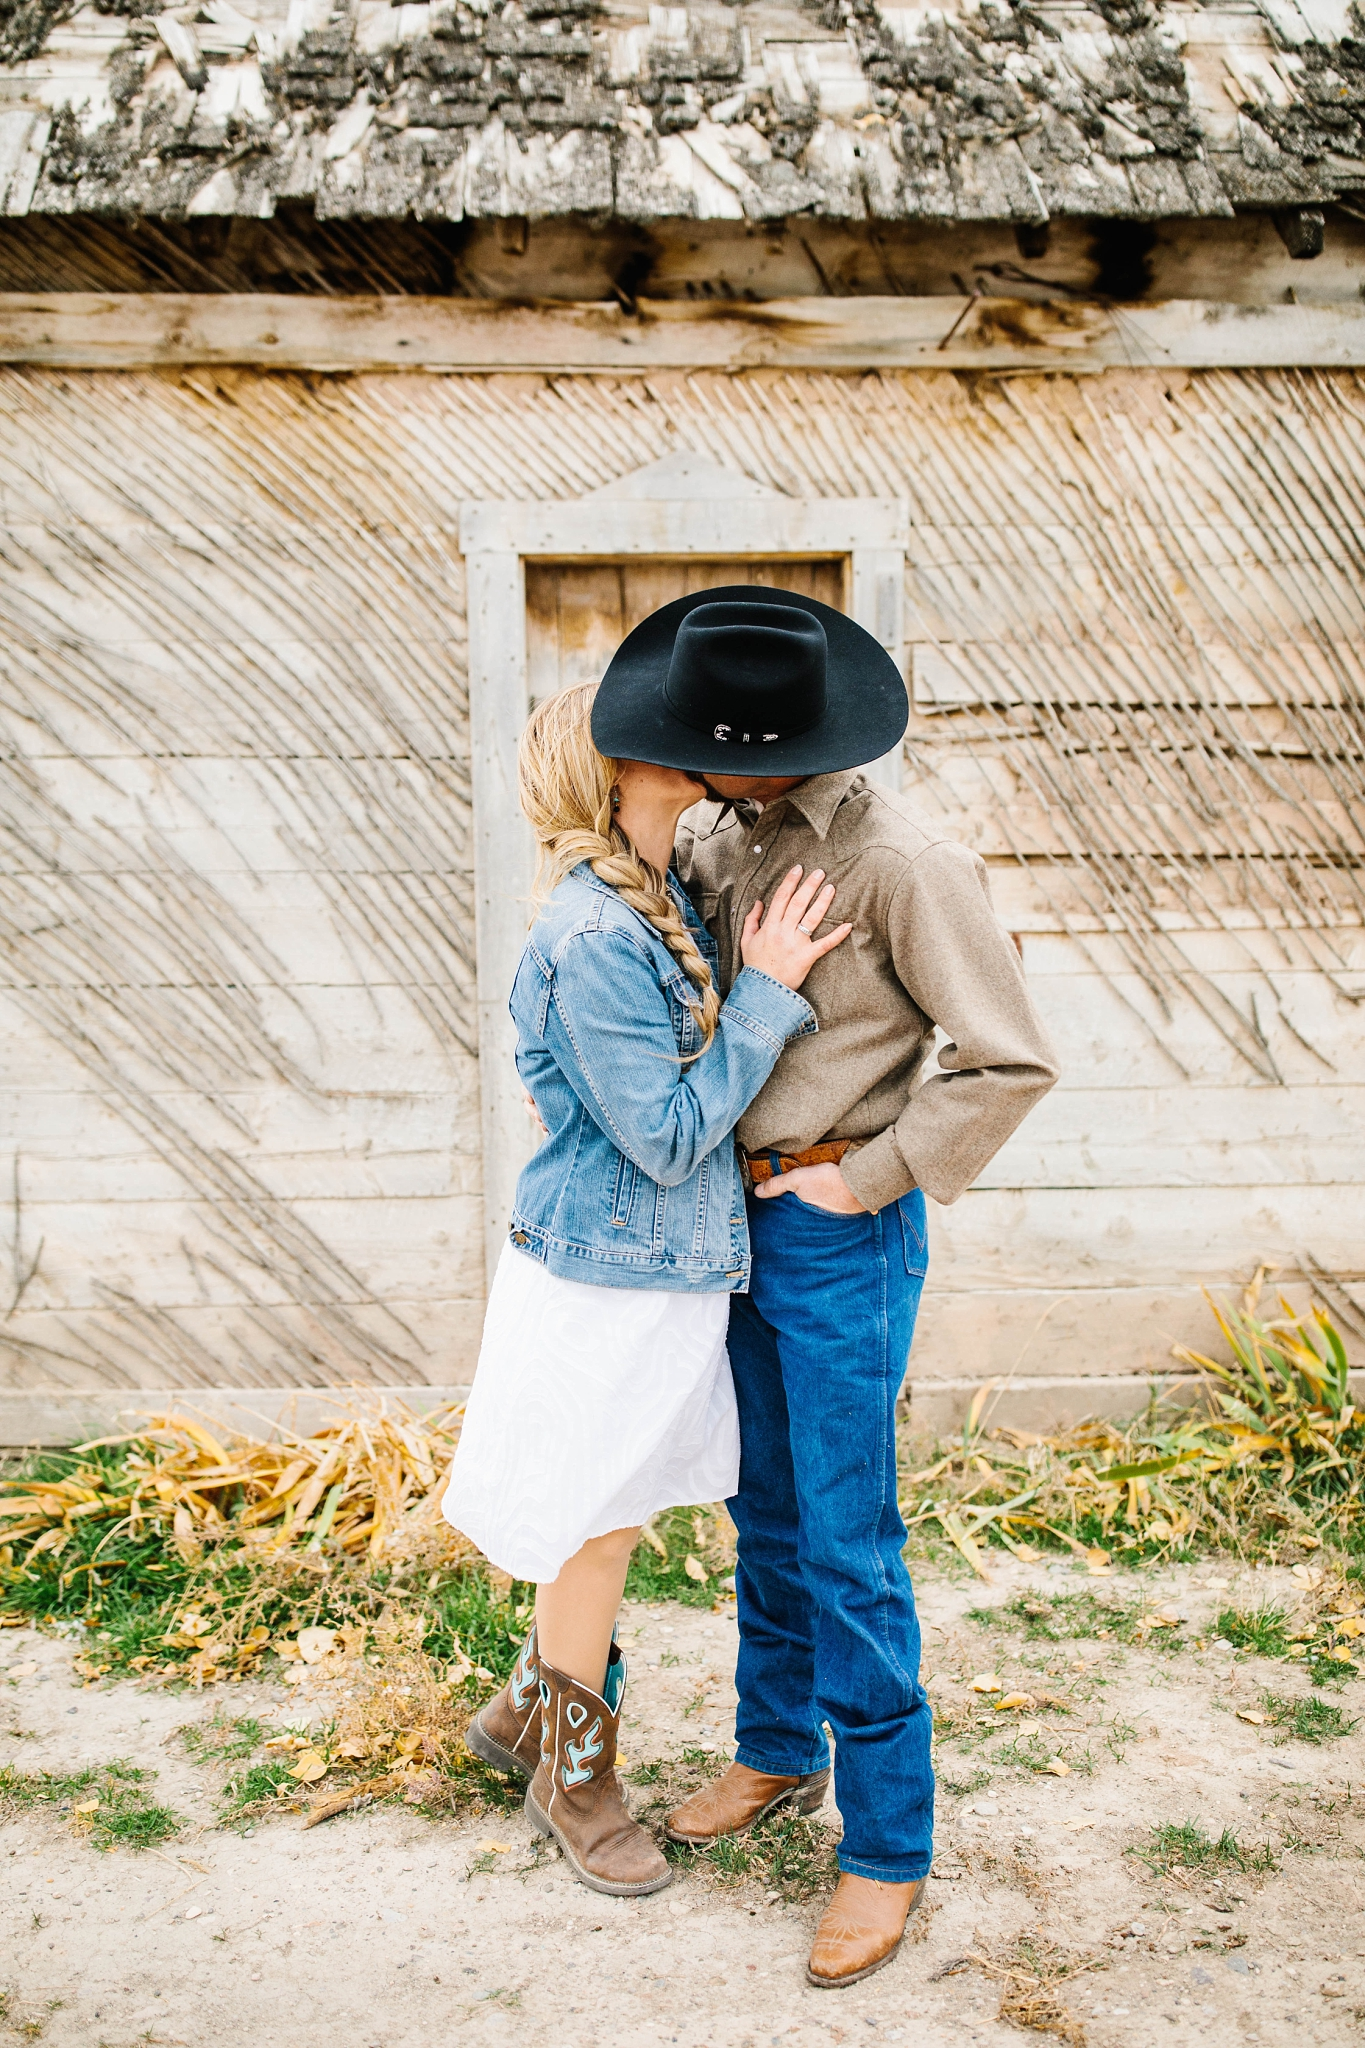 Lister-109_Lizzie-B-Imagery-Utah-Family-Photographer-Lifestyle-Photography-Salt-Lake-City-Park-City-Utah-County-Farm-Family-Session.jpg